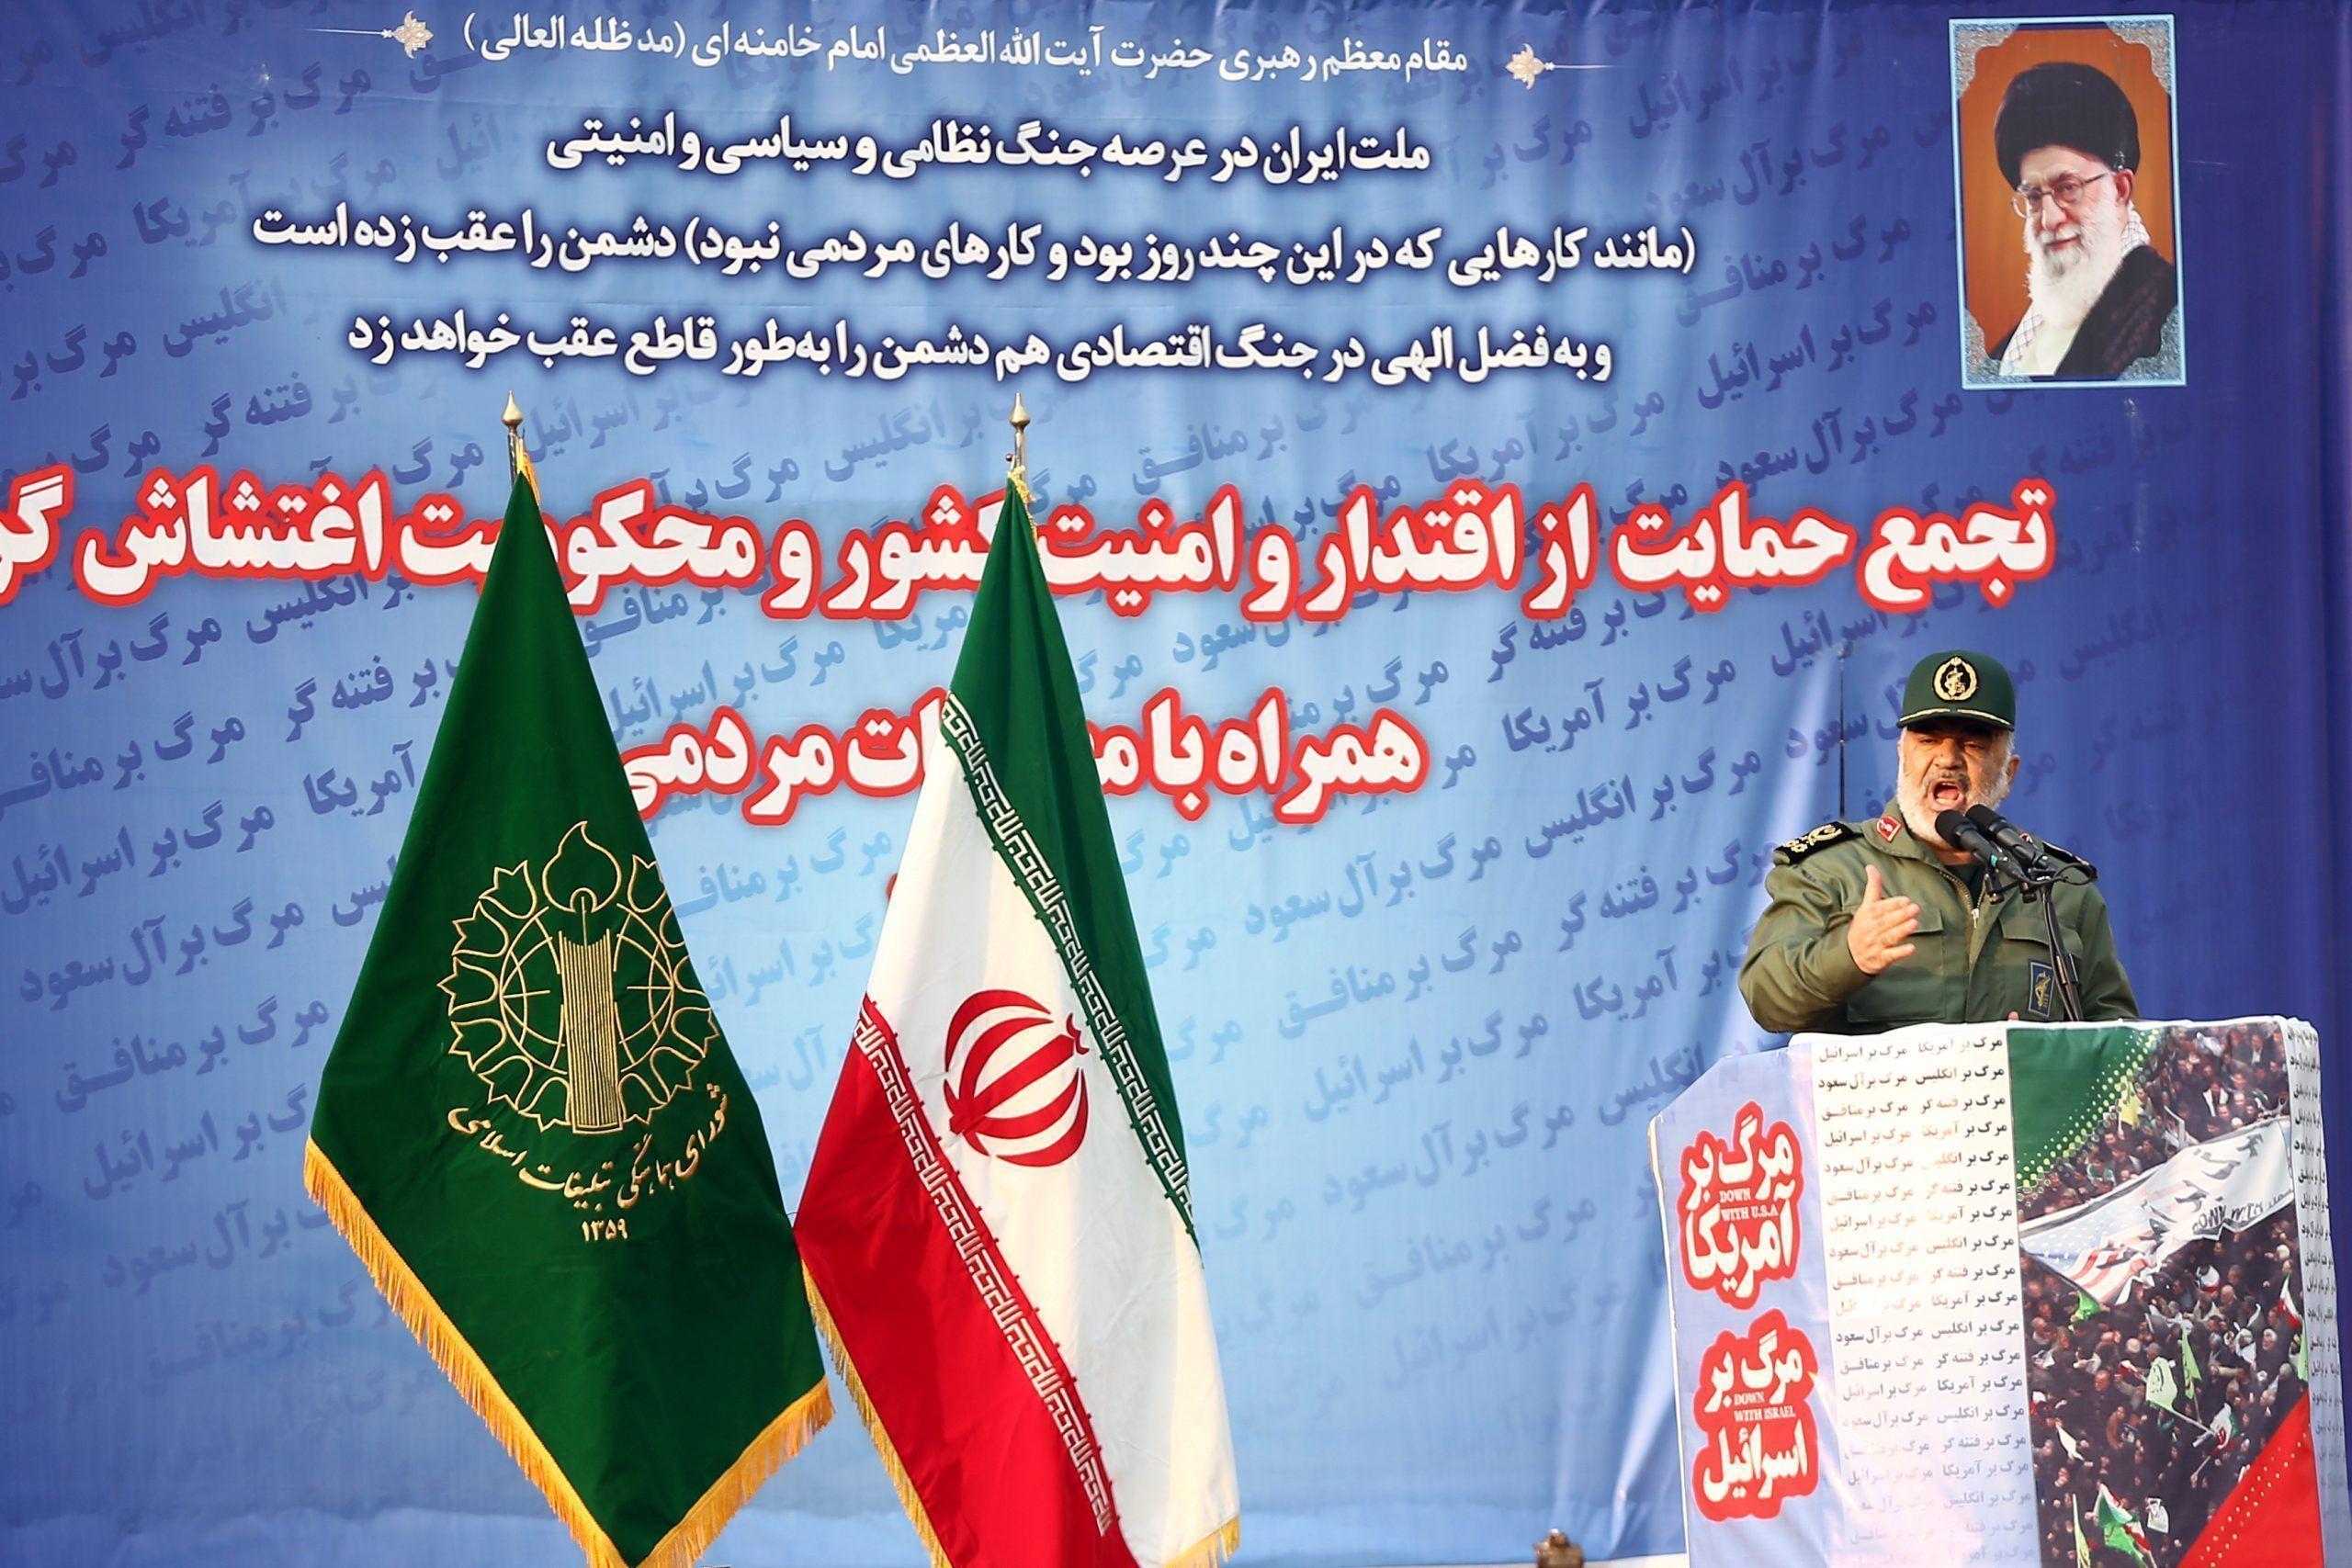 2019-11-25T141648Z_1994535751_RC2EID9D7CTI_RTRMADP_3_IRAN-GASOLINE-PROTESTS-scaled